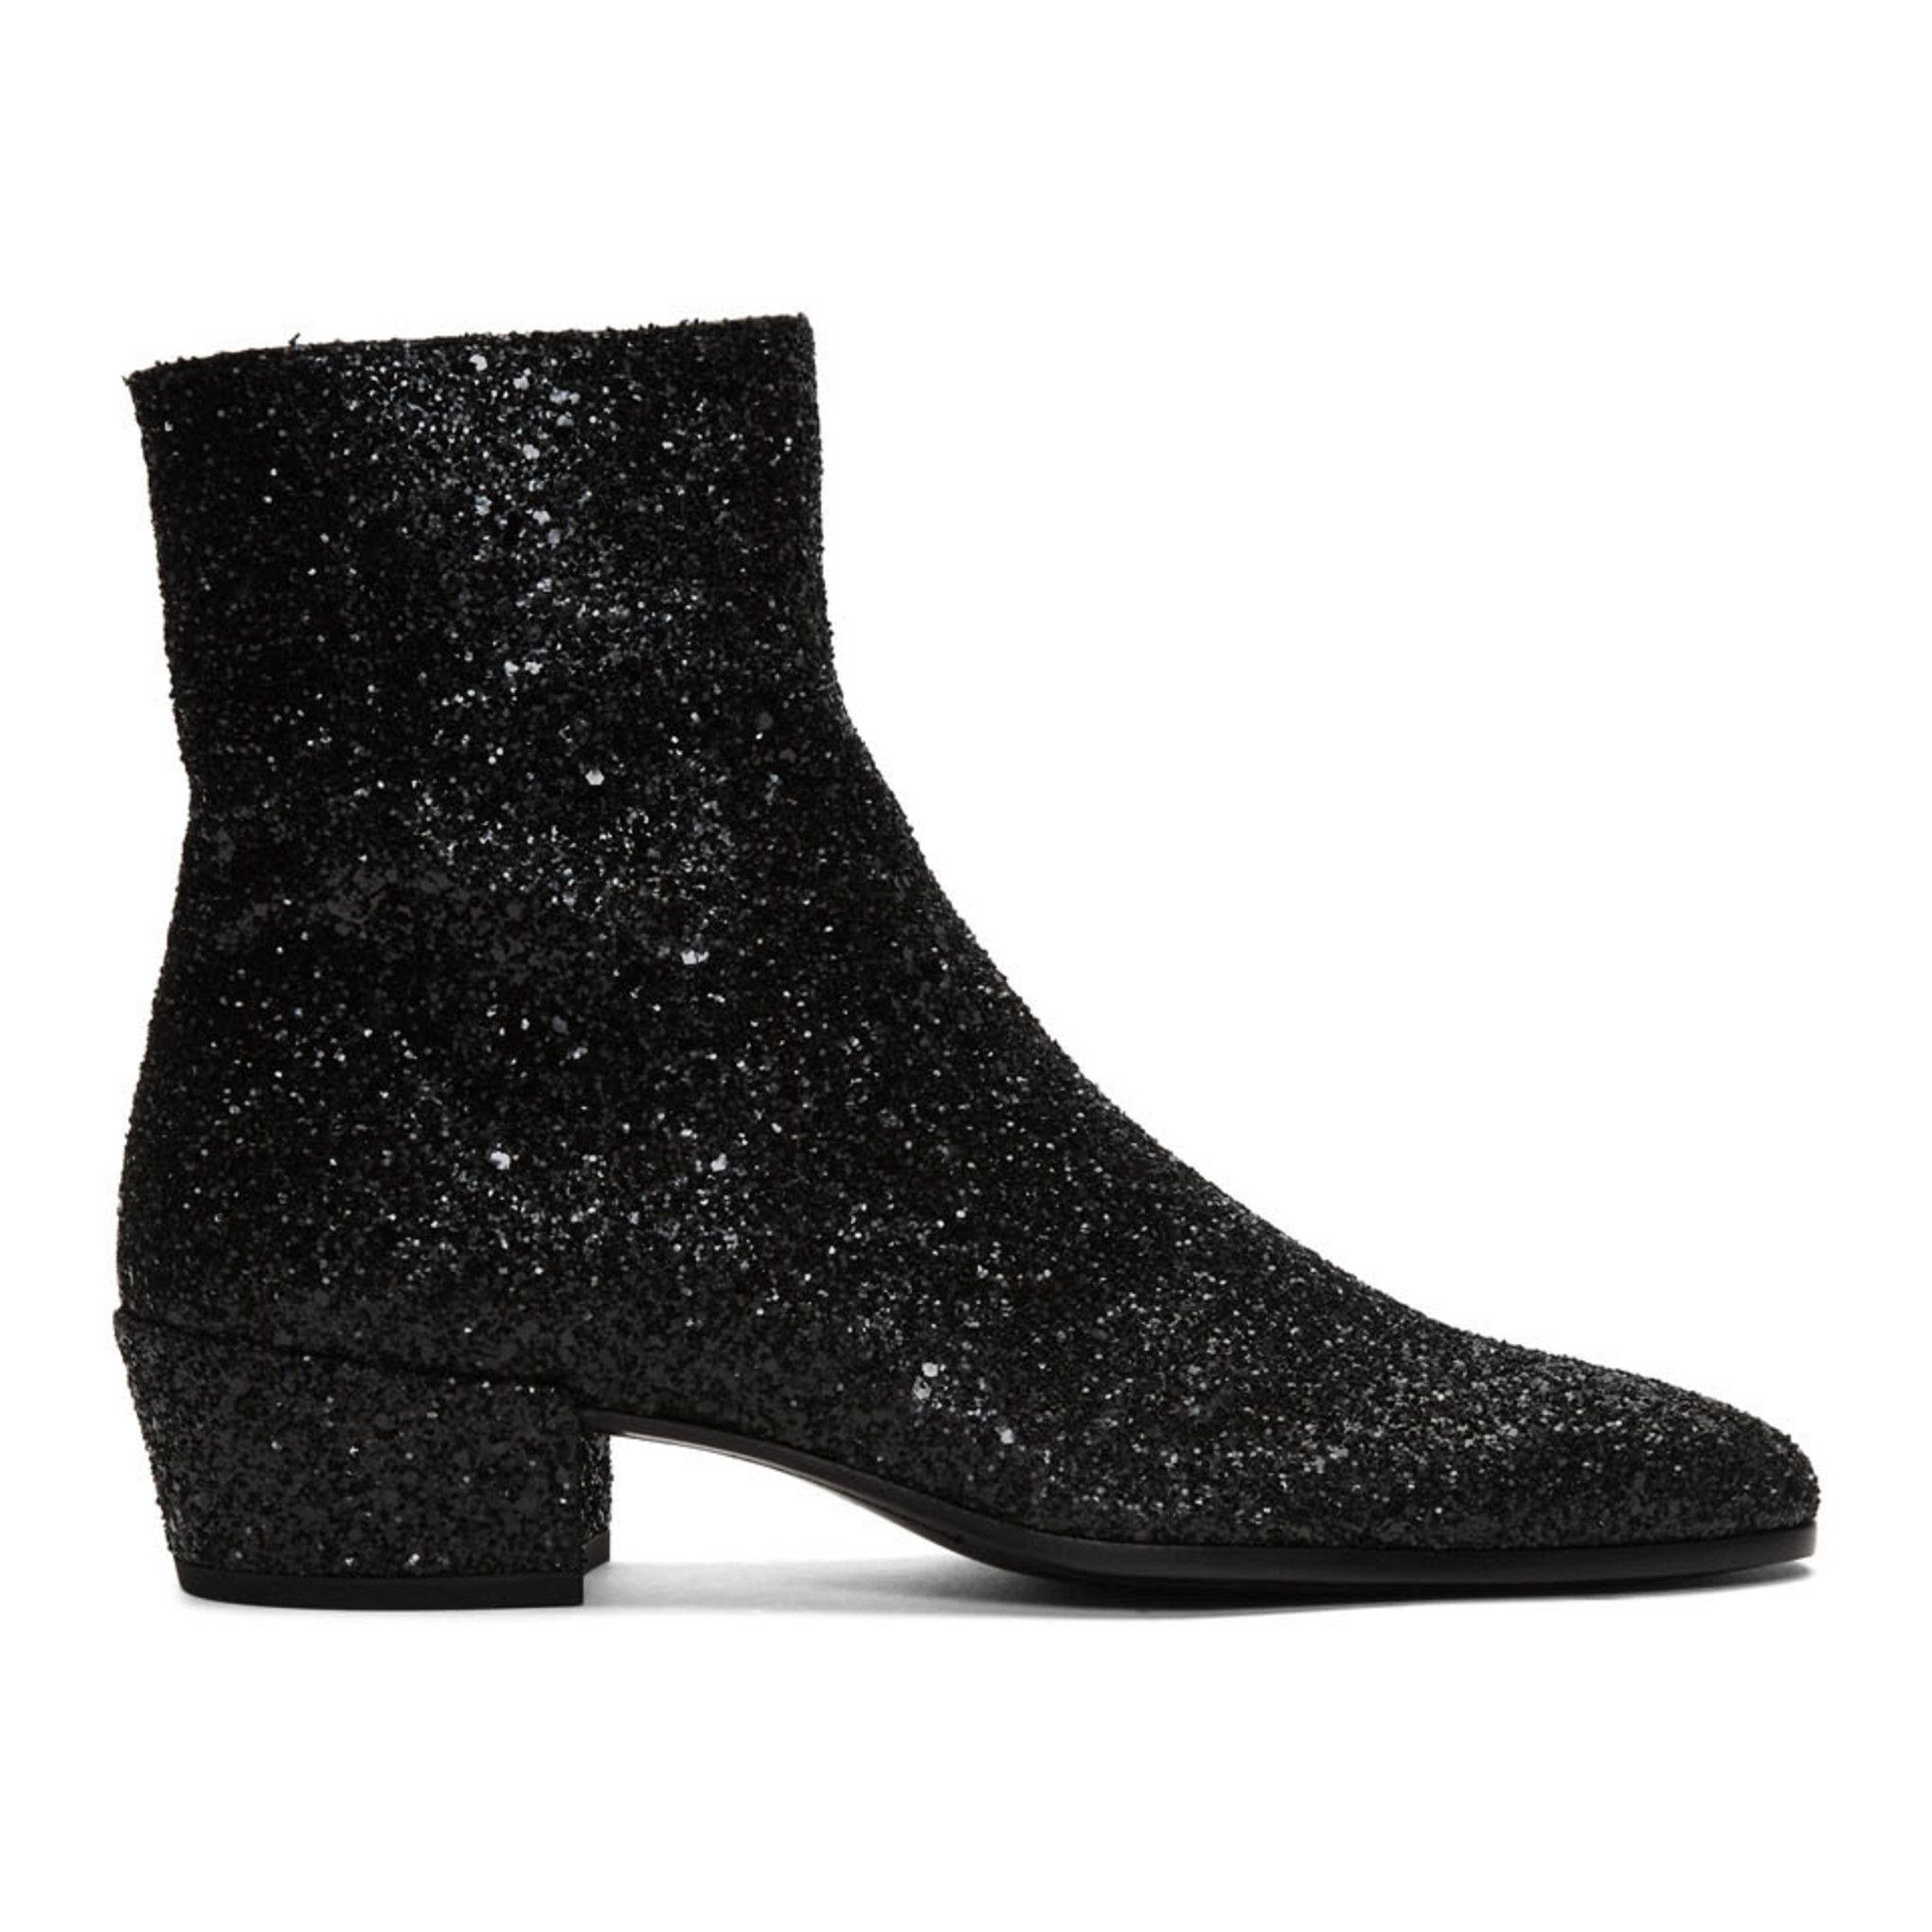 Black Glitter Caleb Zippered Boots